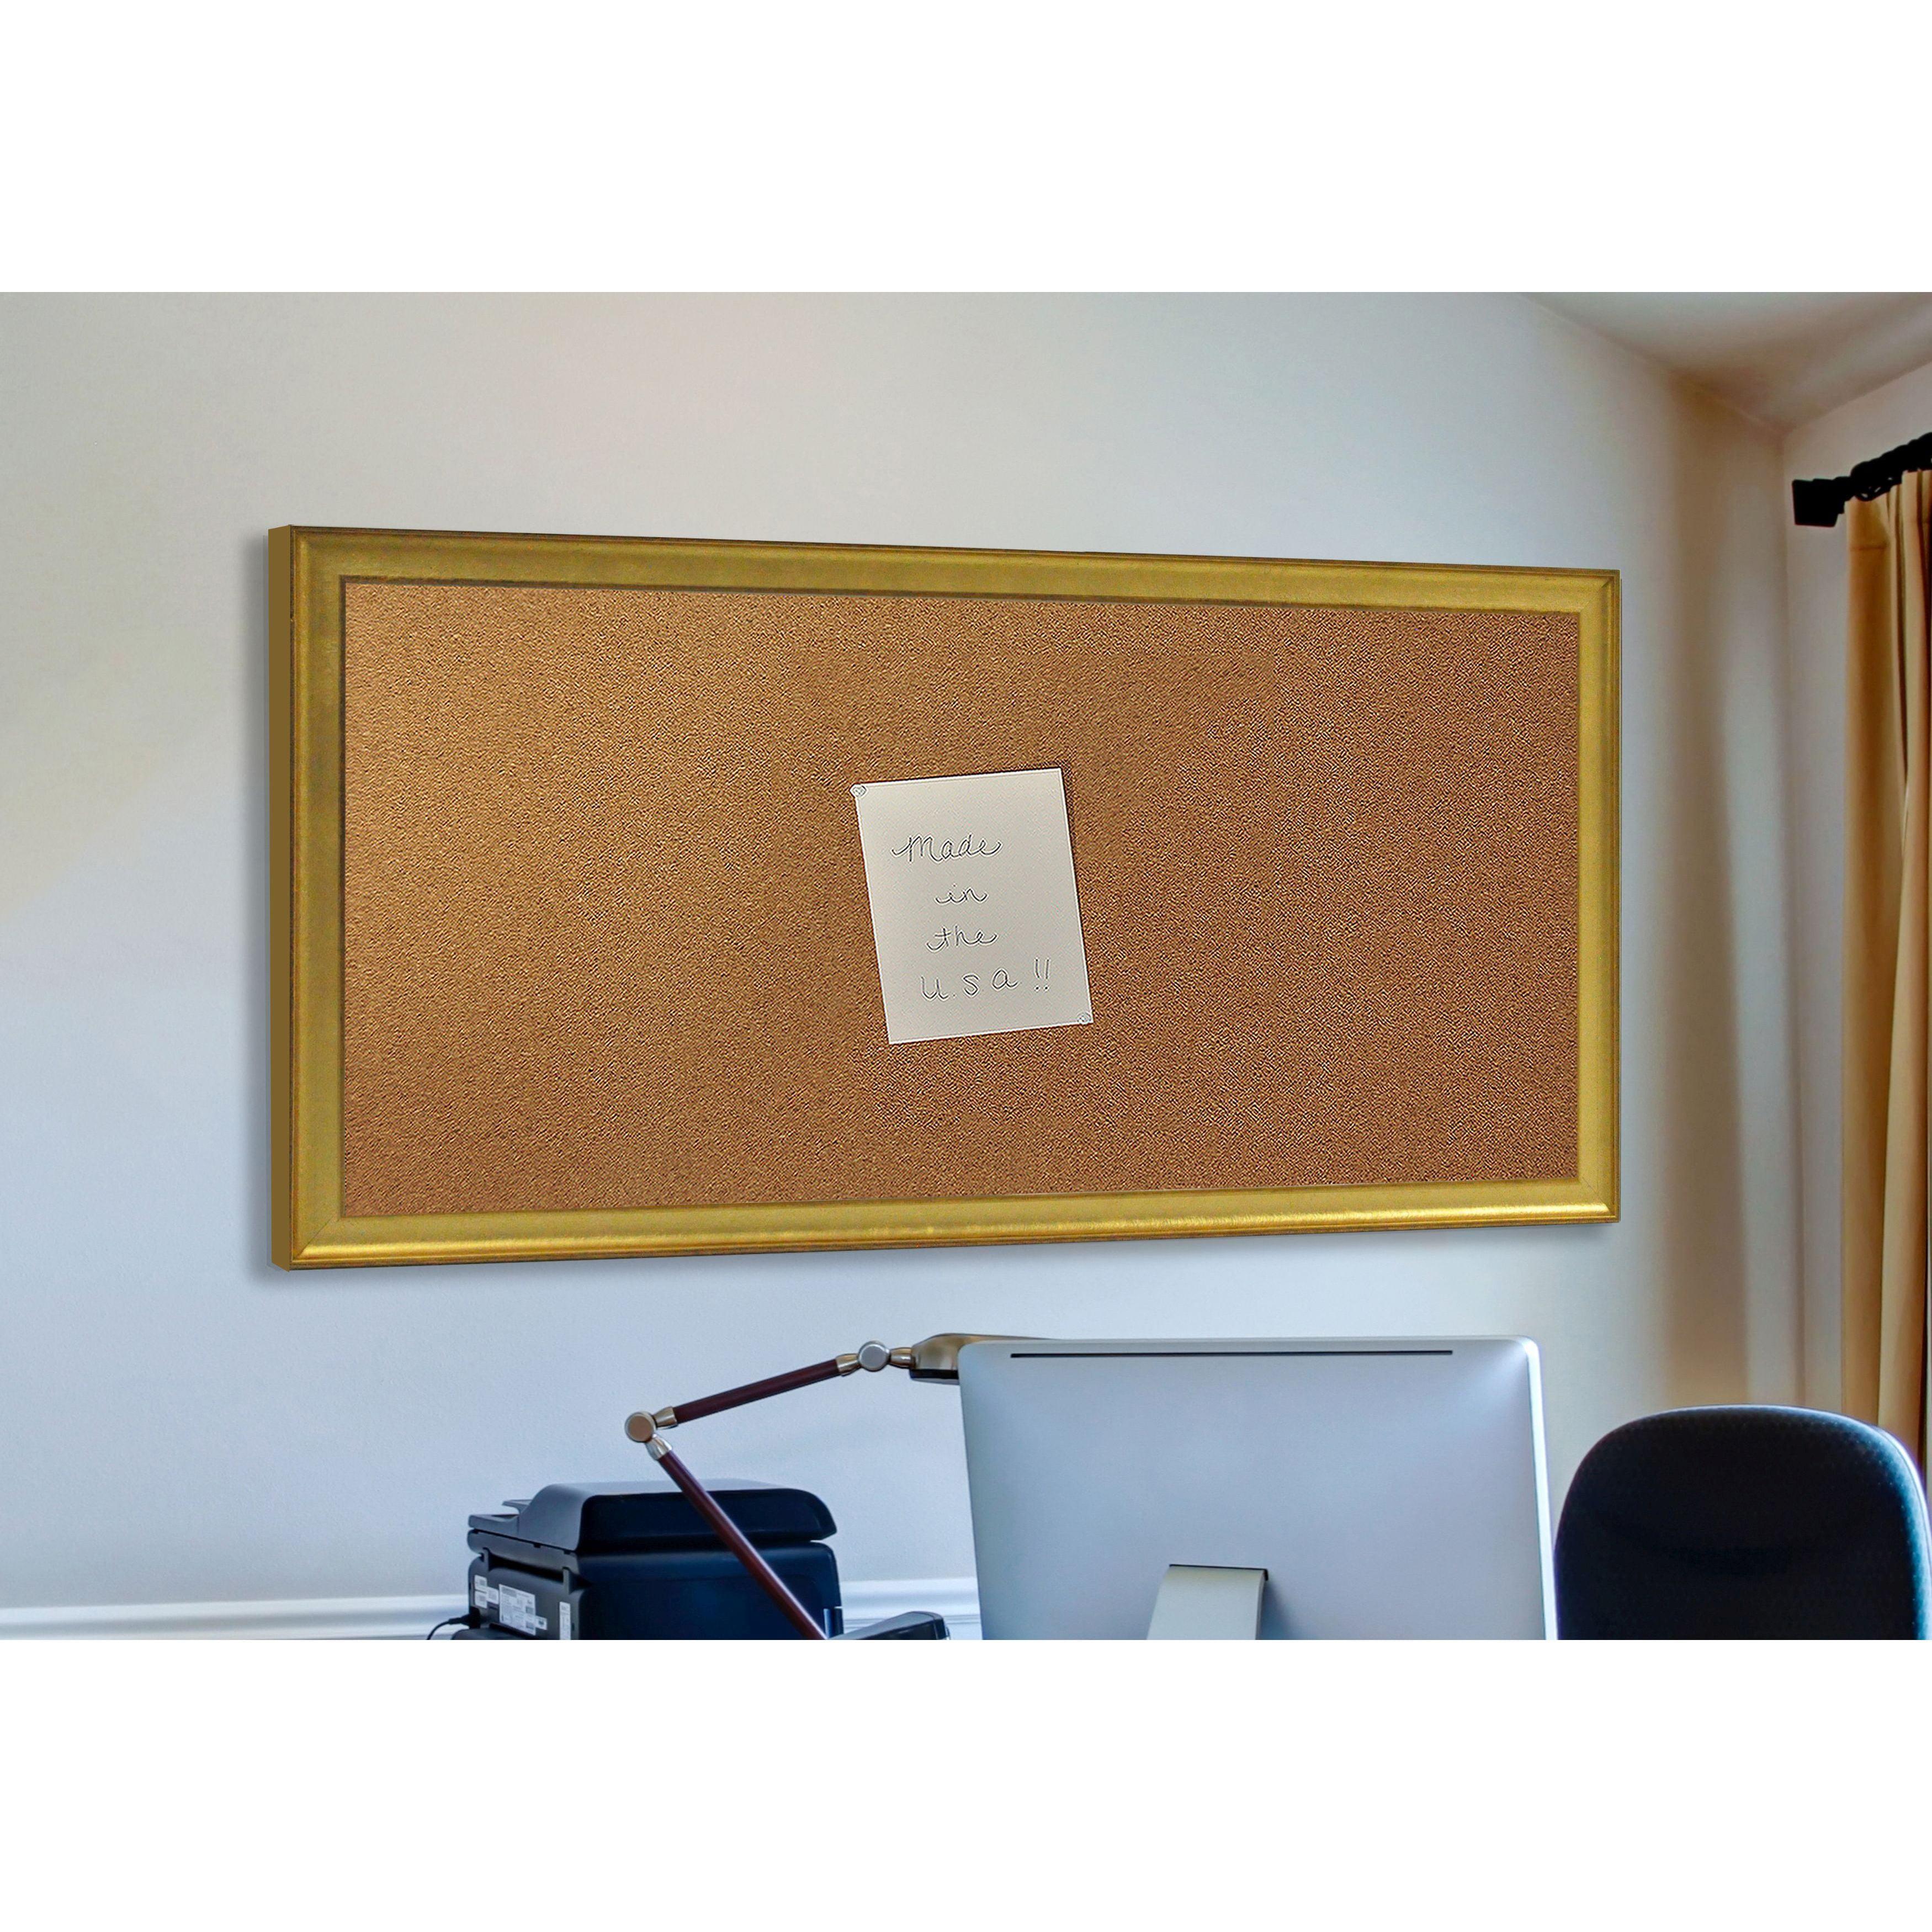 Rayne Mirrors Madilyn Nichole Vintage Wall Mounted Bulletin Board